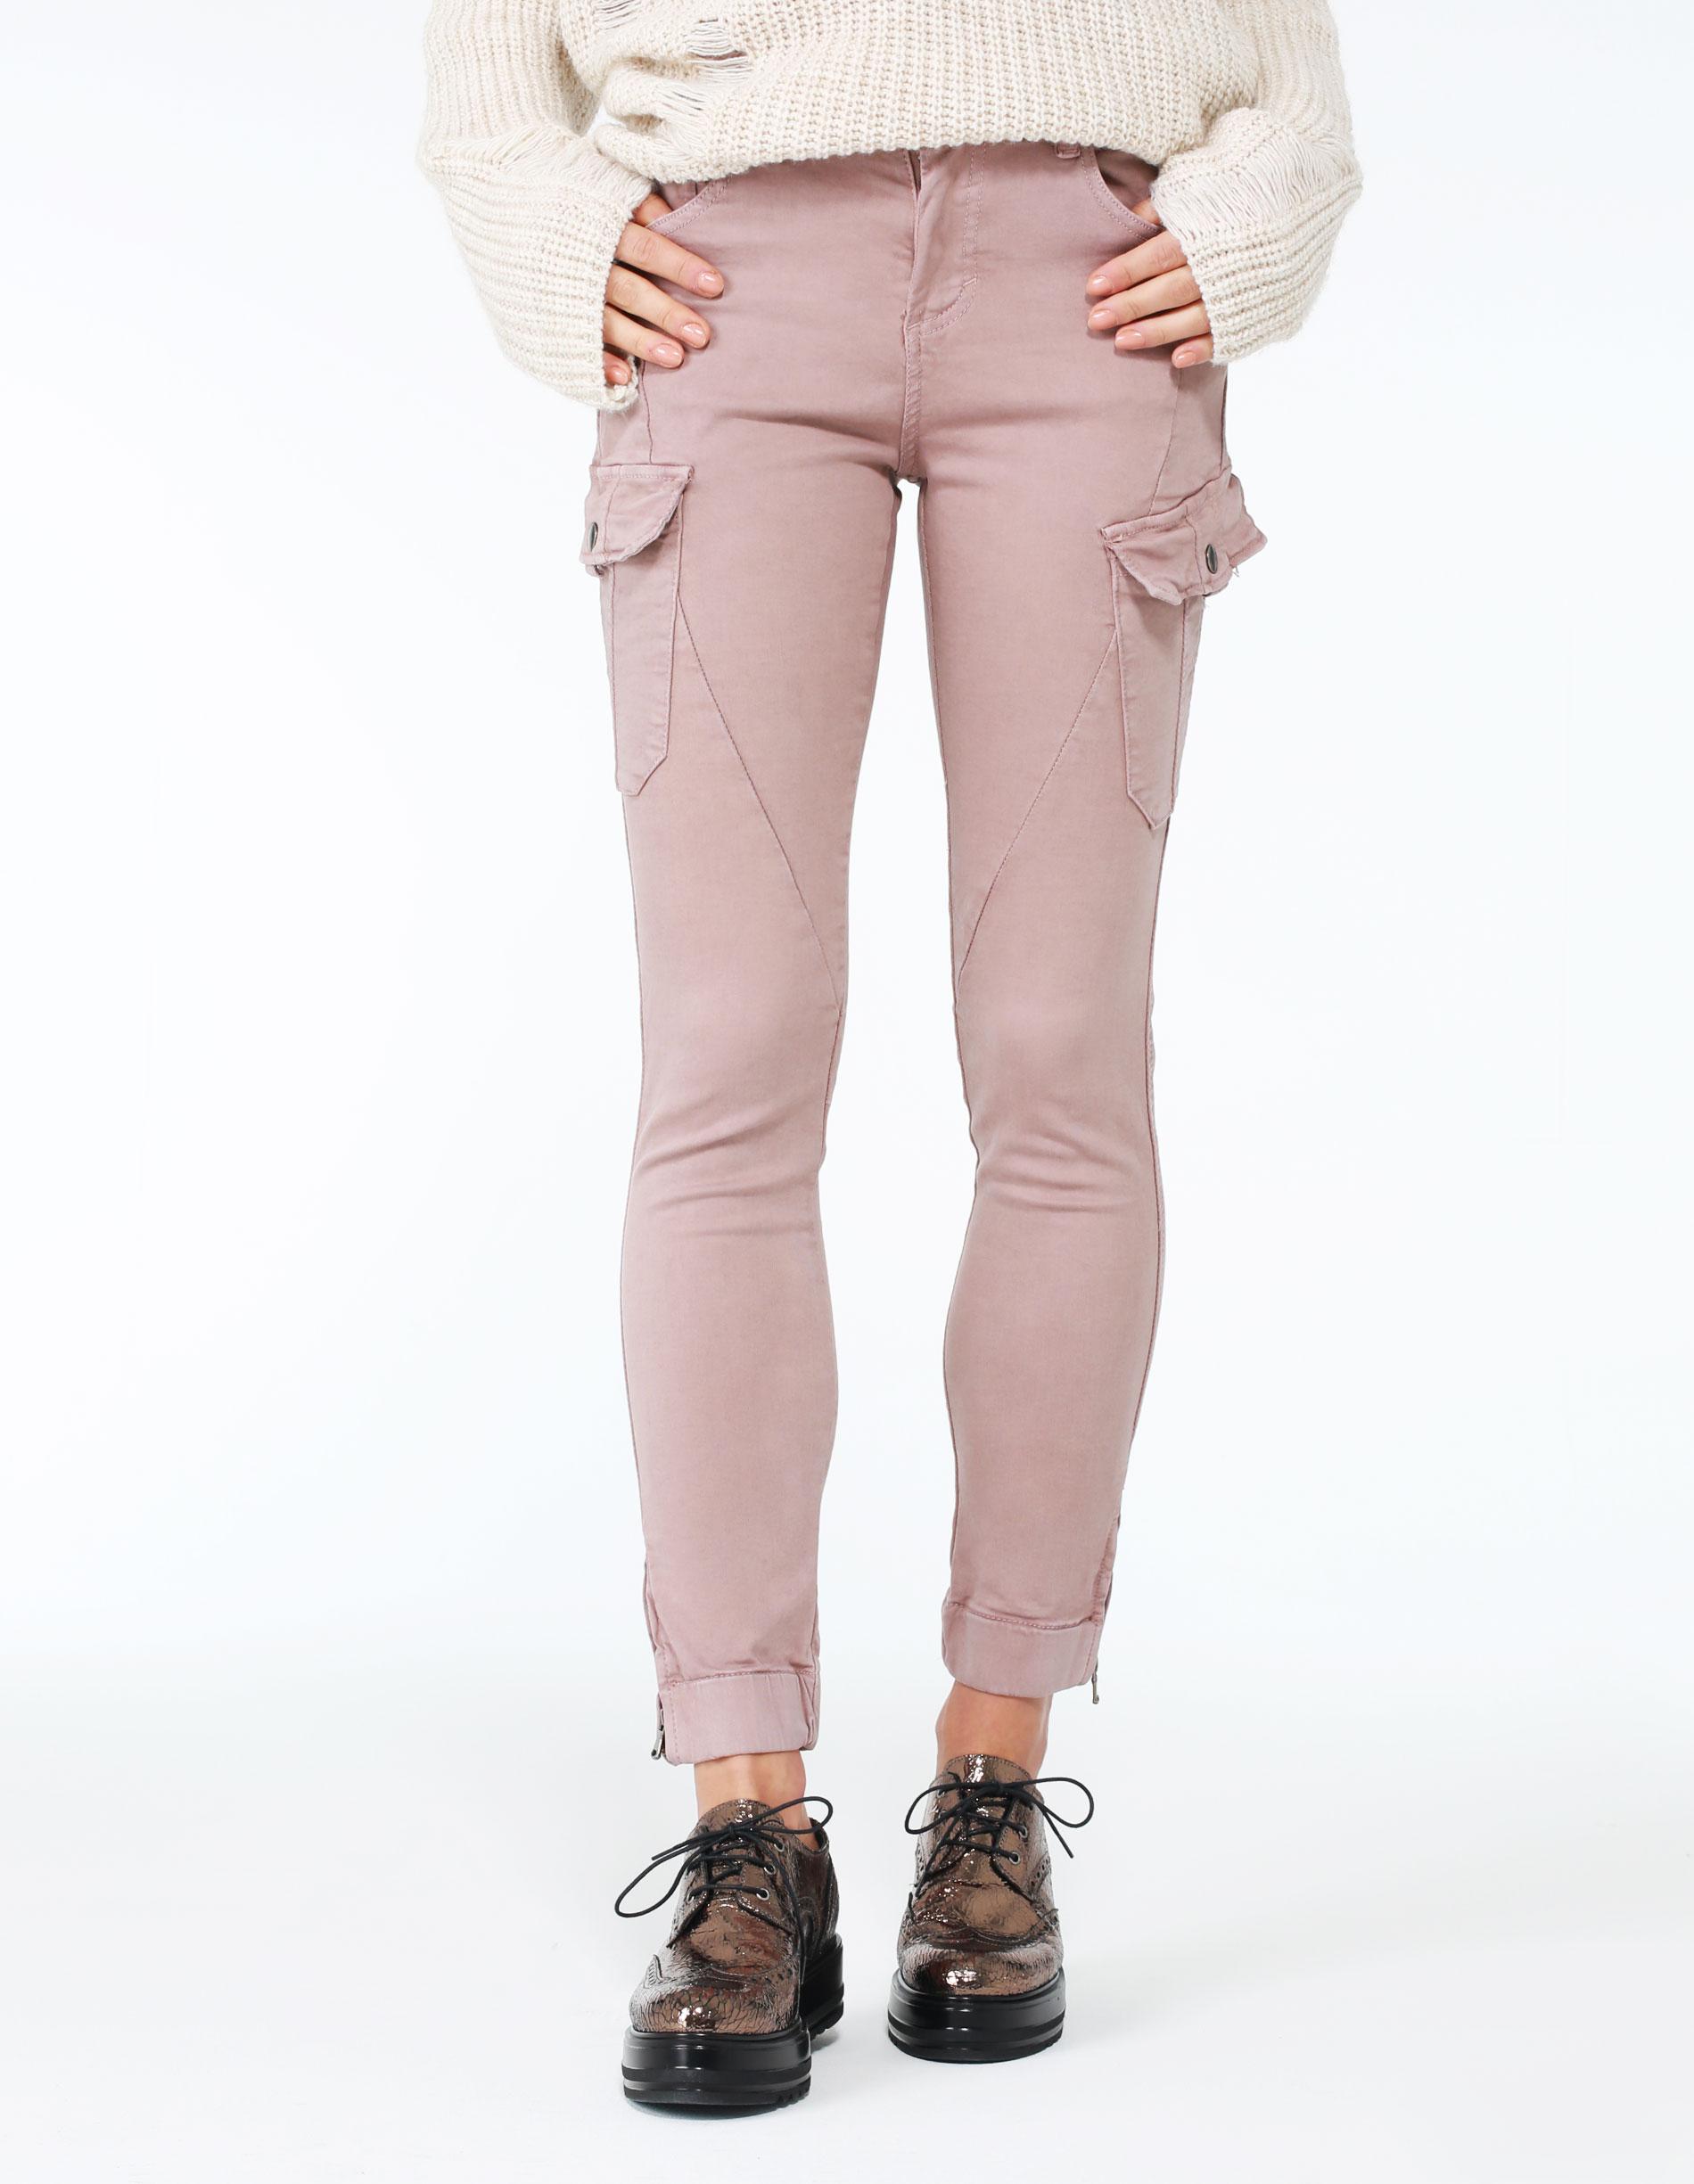 Spodnie - 70-4018 ROSA - Unisono